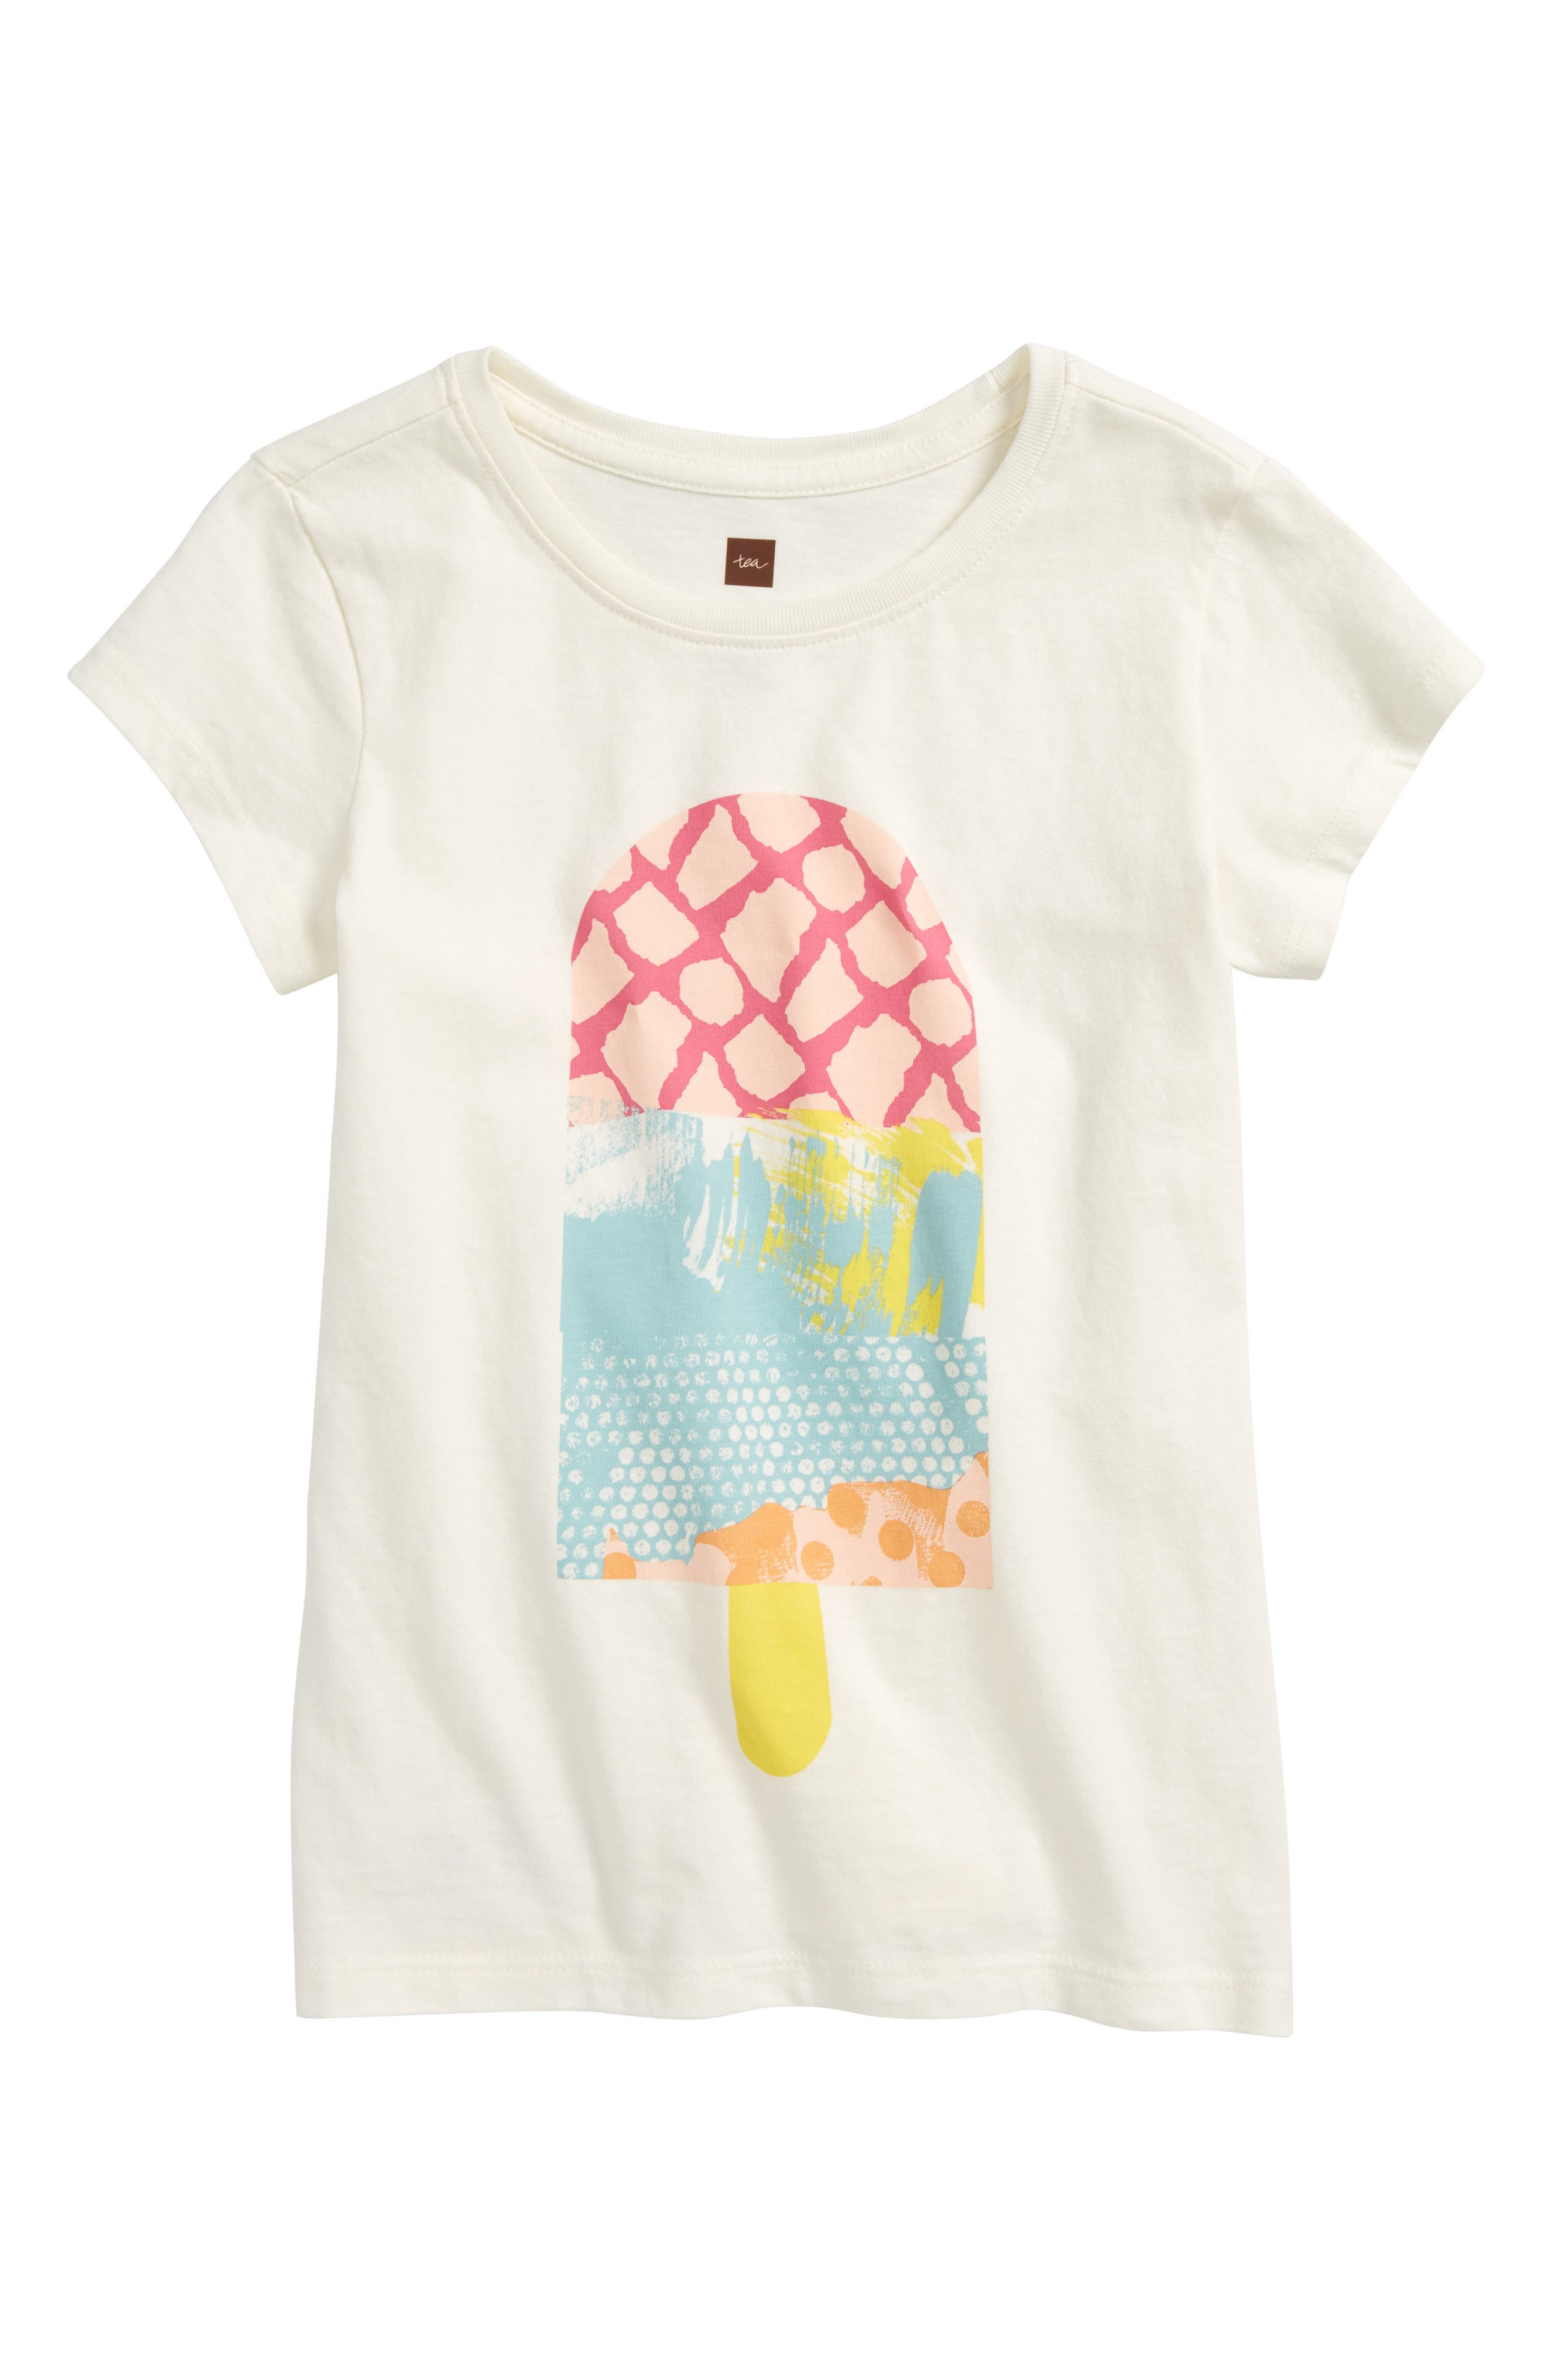 Tea Collection Popsicle Tee (Toddler Girls, Little Girls & Big Girls)